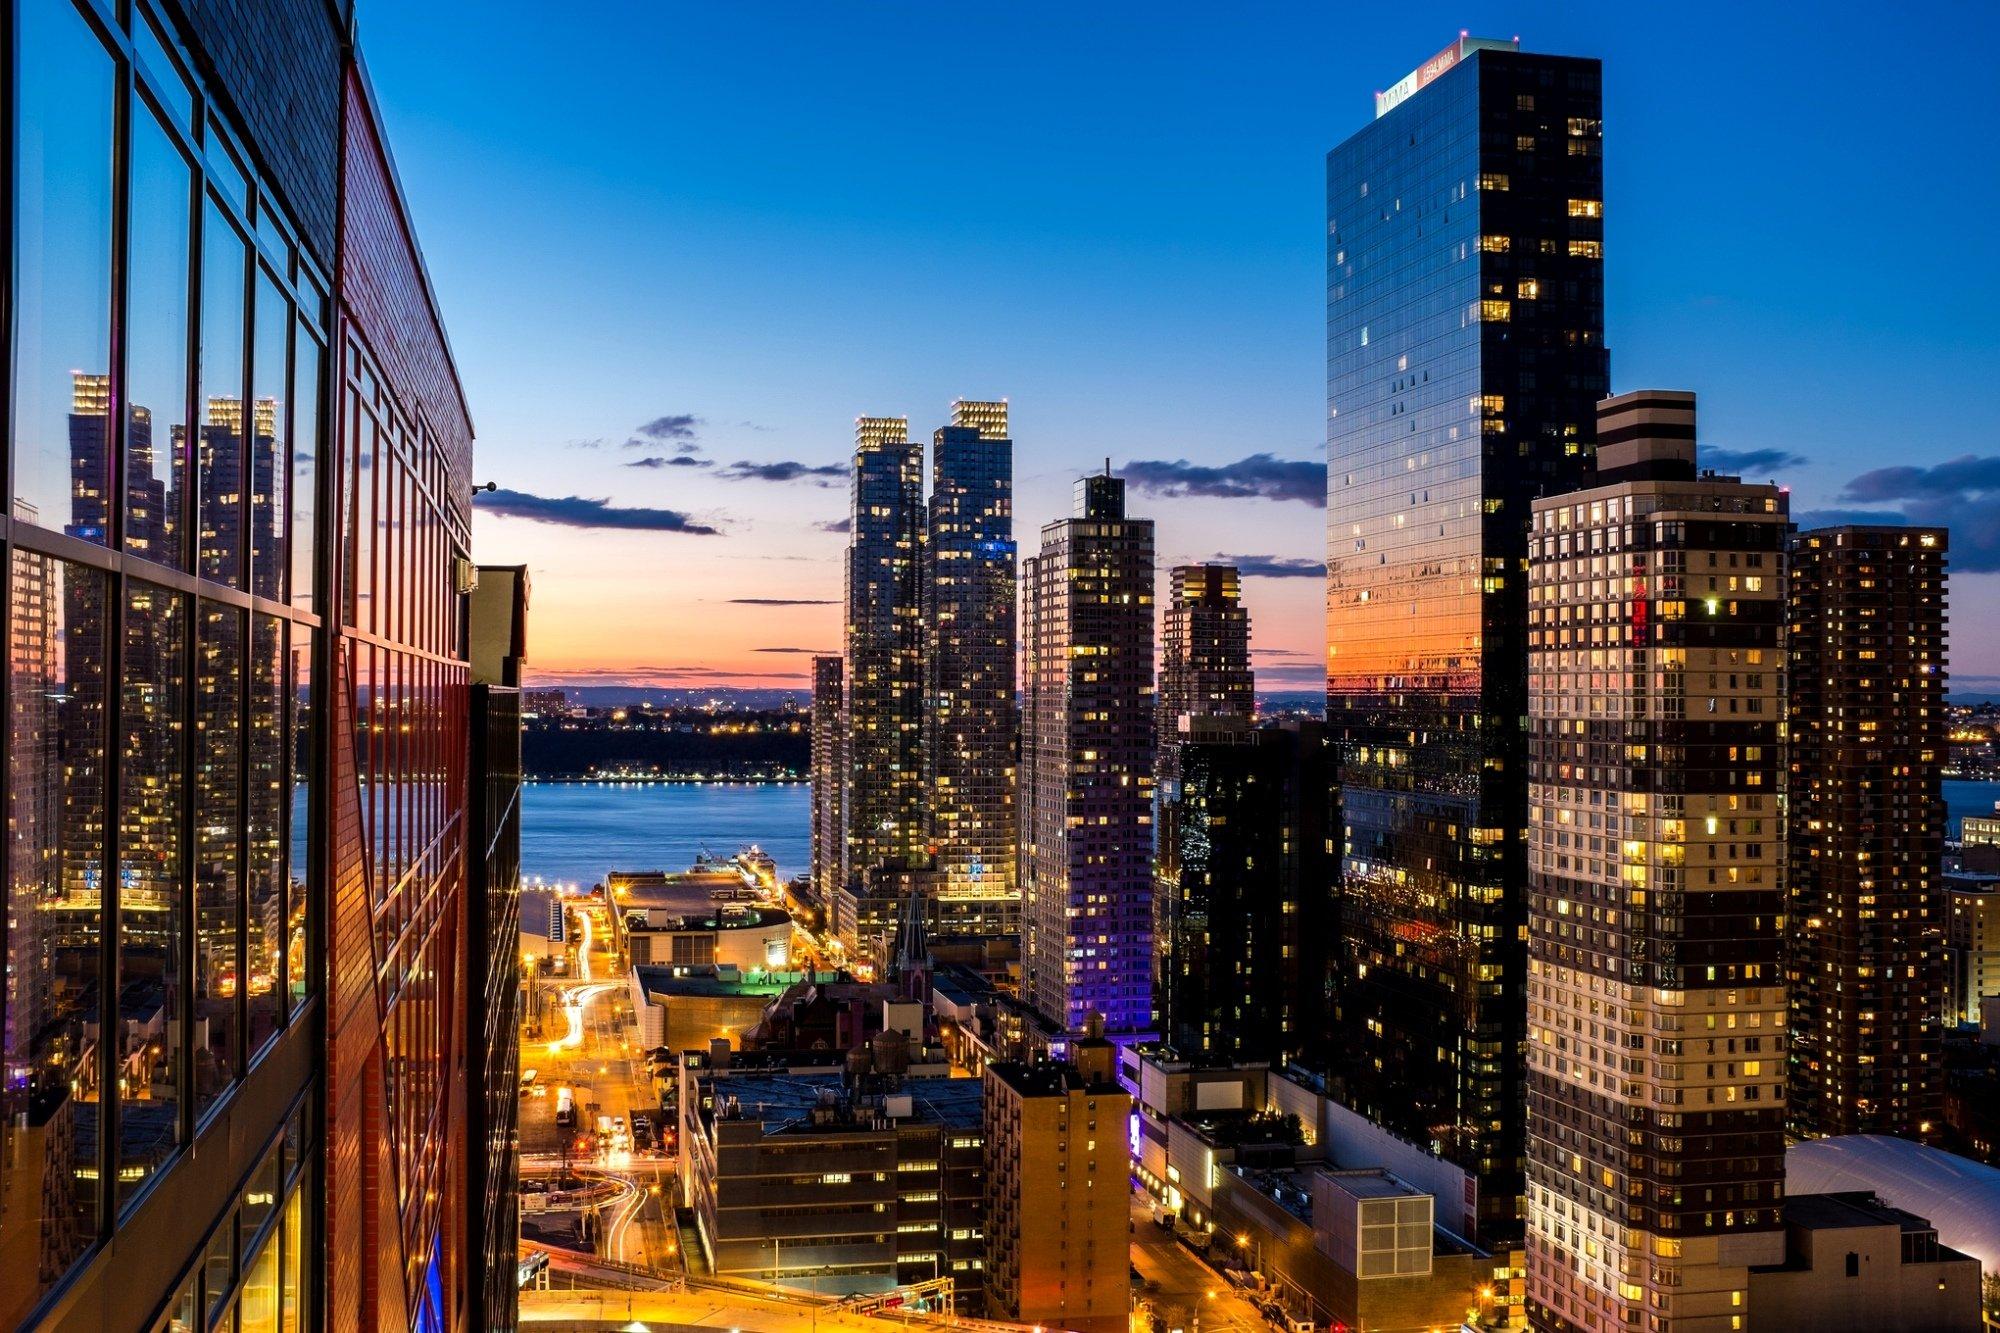 city town night light window look panorama wallpaper 2000x1333